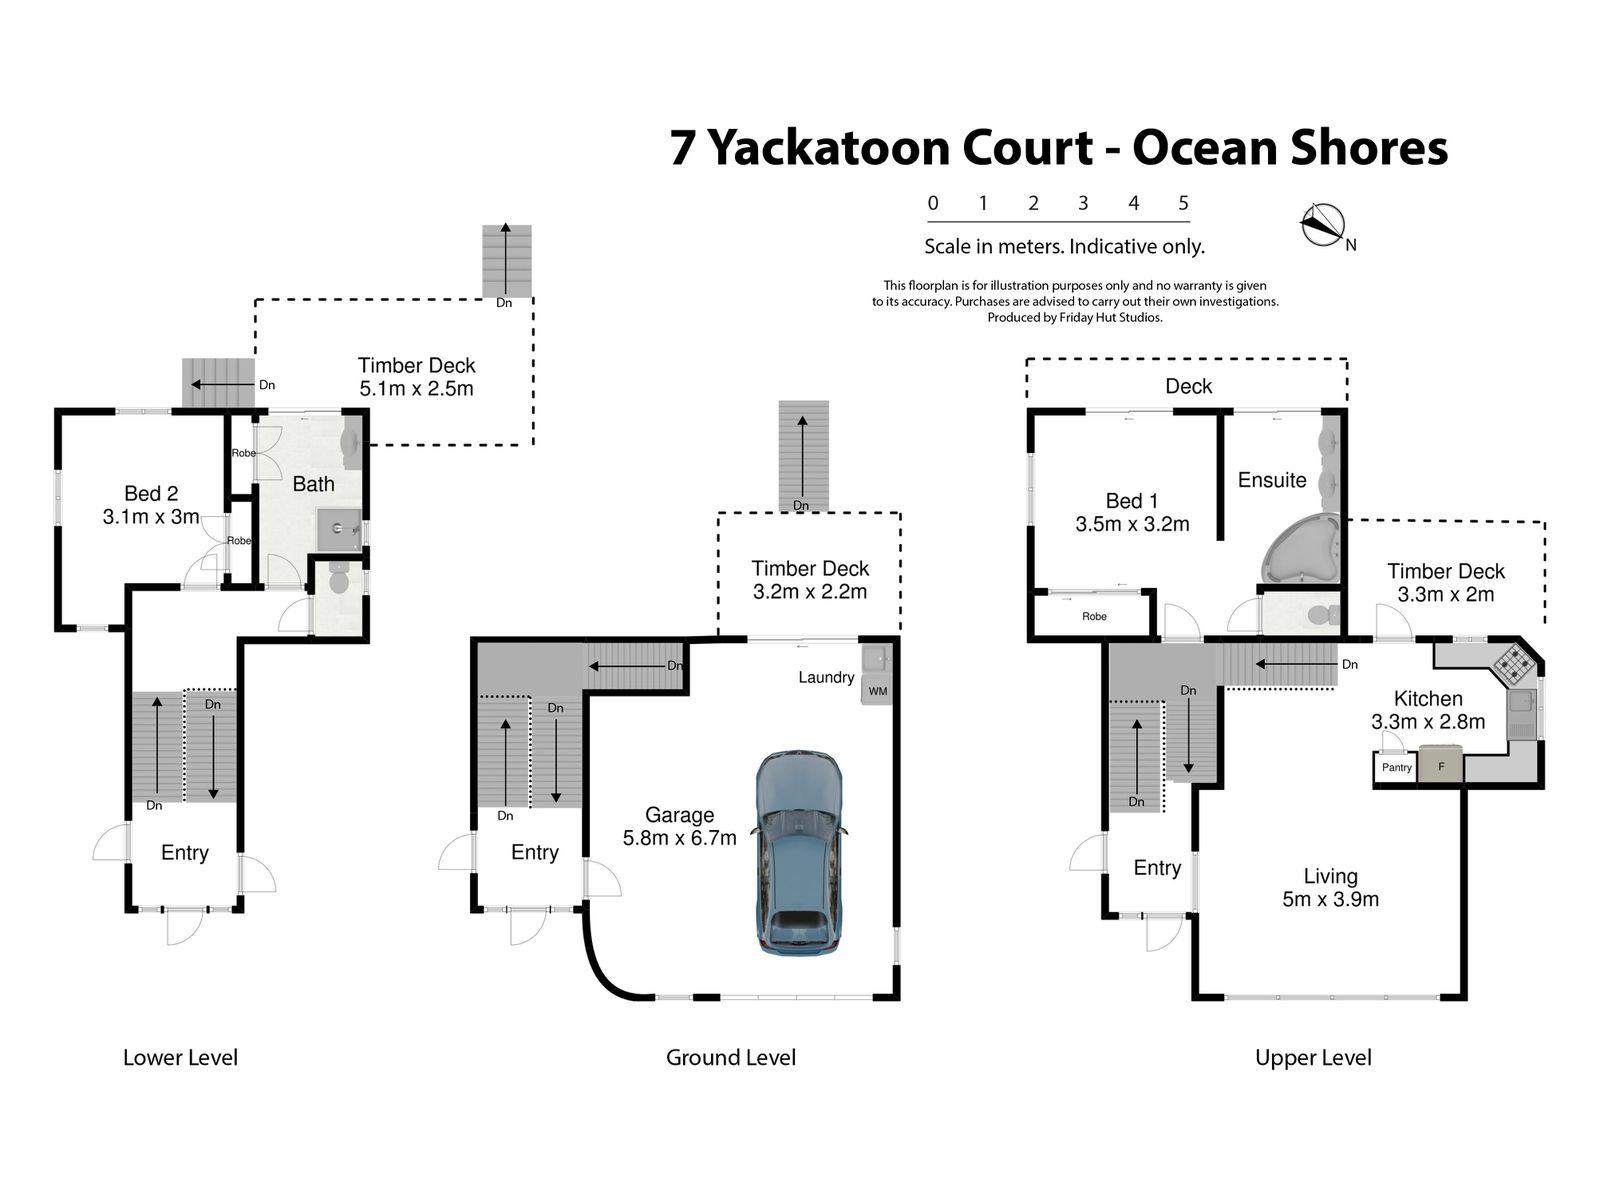 7 Yackatoon Court, Ocean Shores